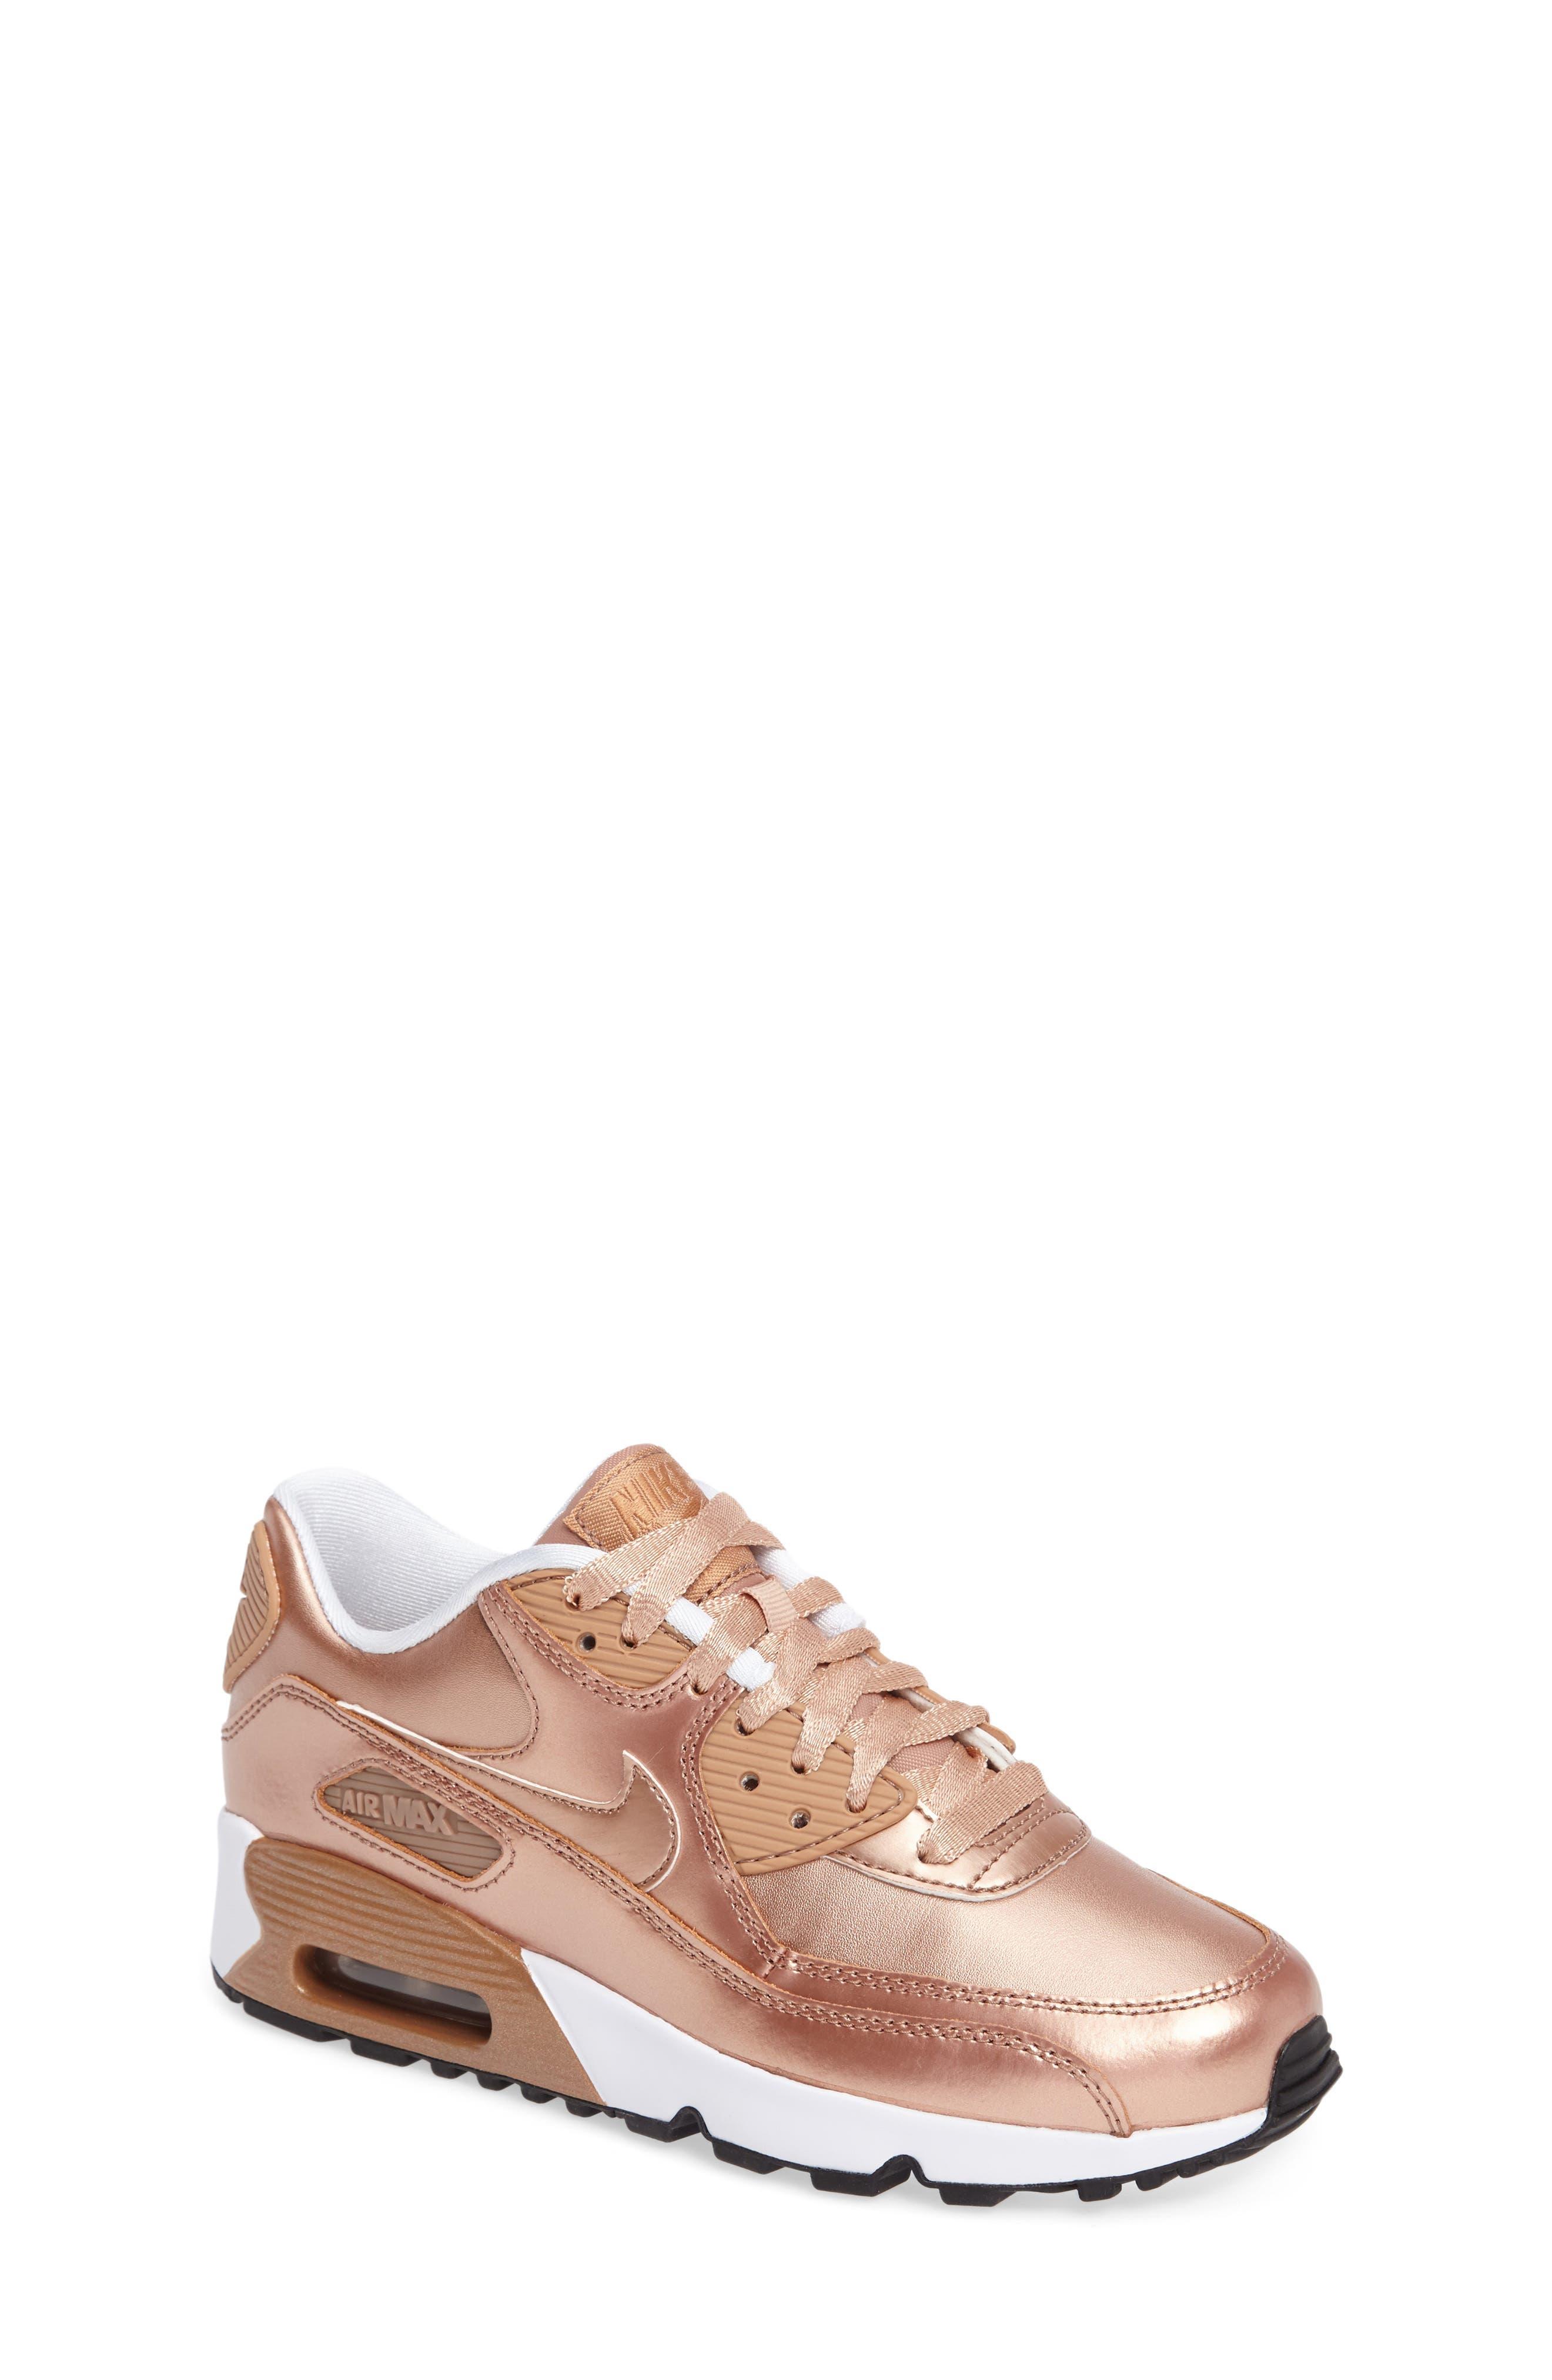 Air Max 90 SE Sneaker,                             Alternate thumbnail 4, color,